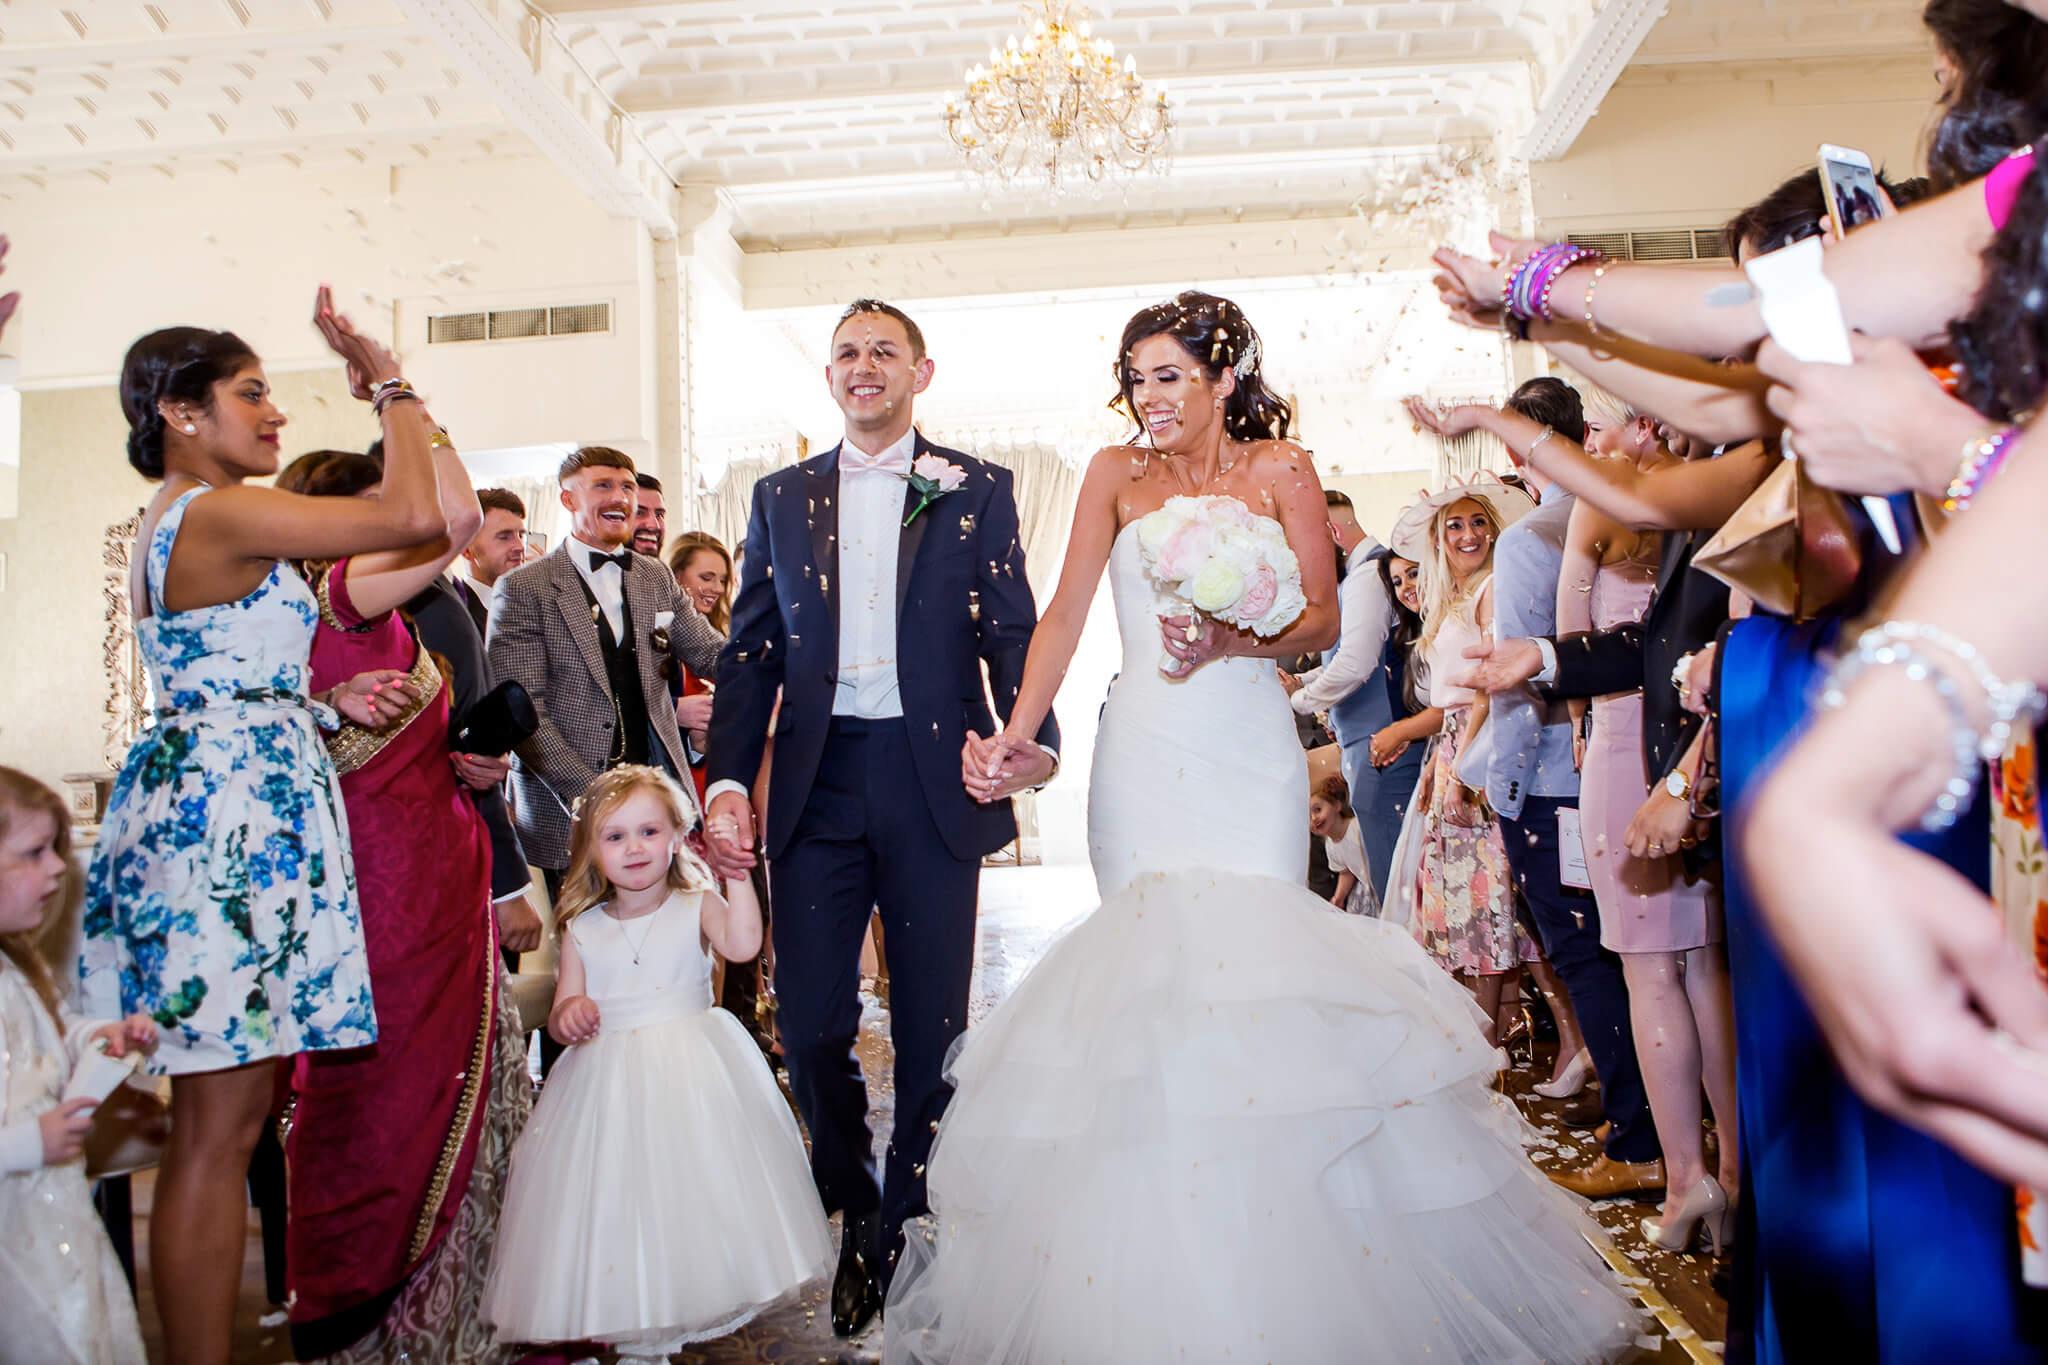 30-james-street-wedding-confetti-happy-brideandgroom